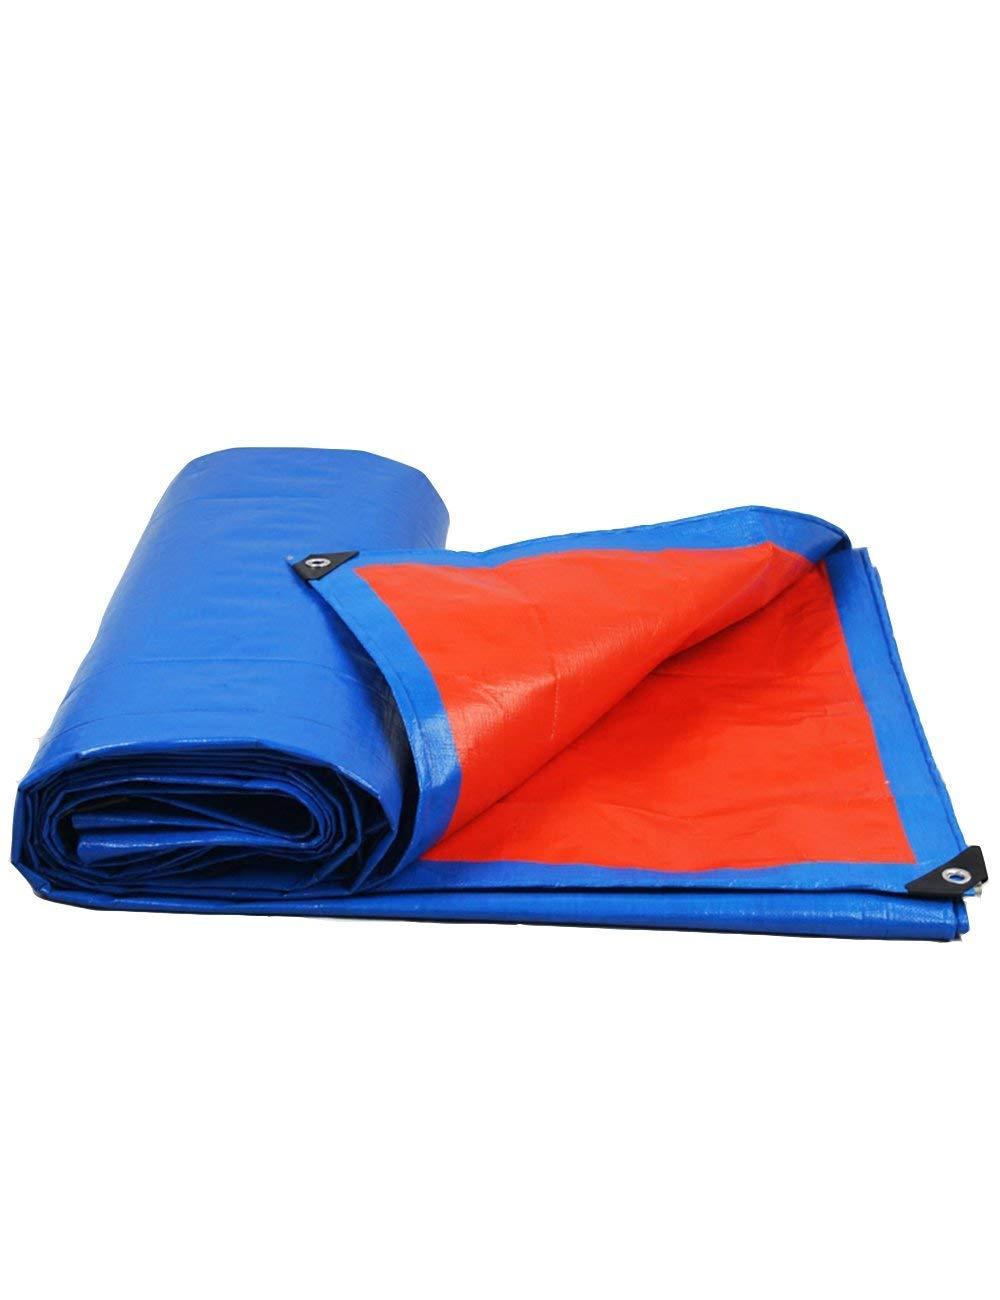 DLyng ブルー防水ターポリンカバー厚いタフテントキャンプヘビーデューティシェードタフ (Size : 5m*6m) 5m*6m  B07GYMVSMH